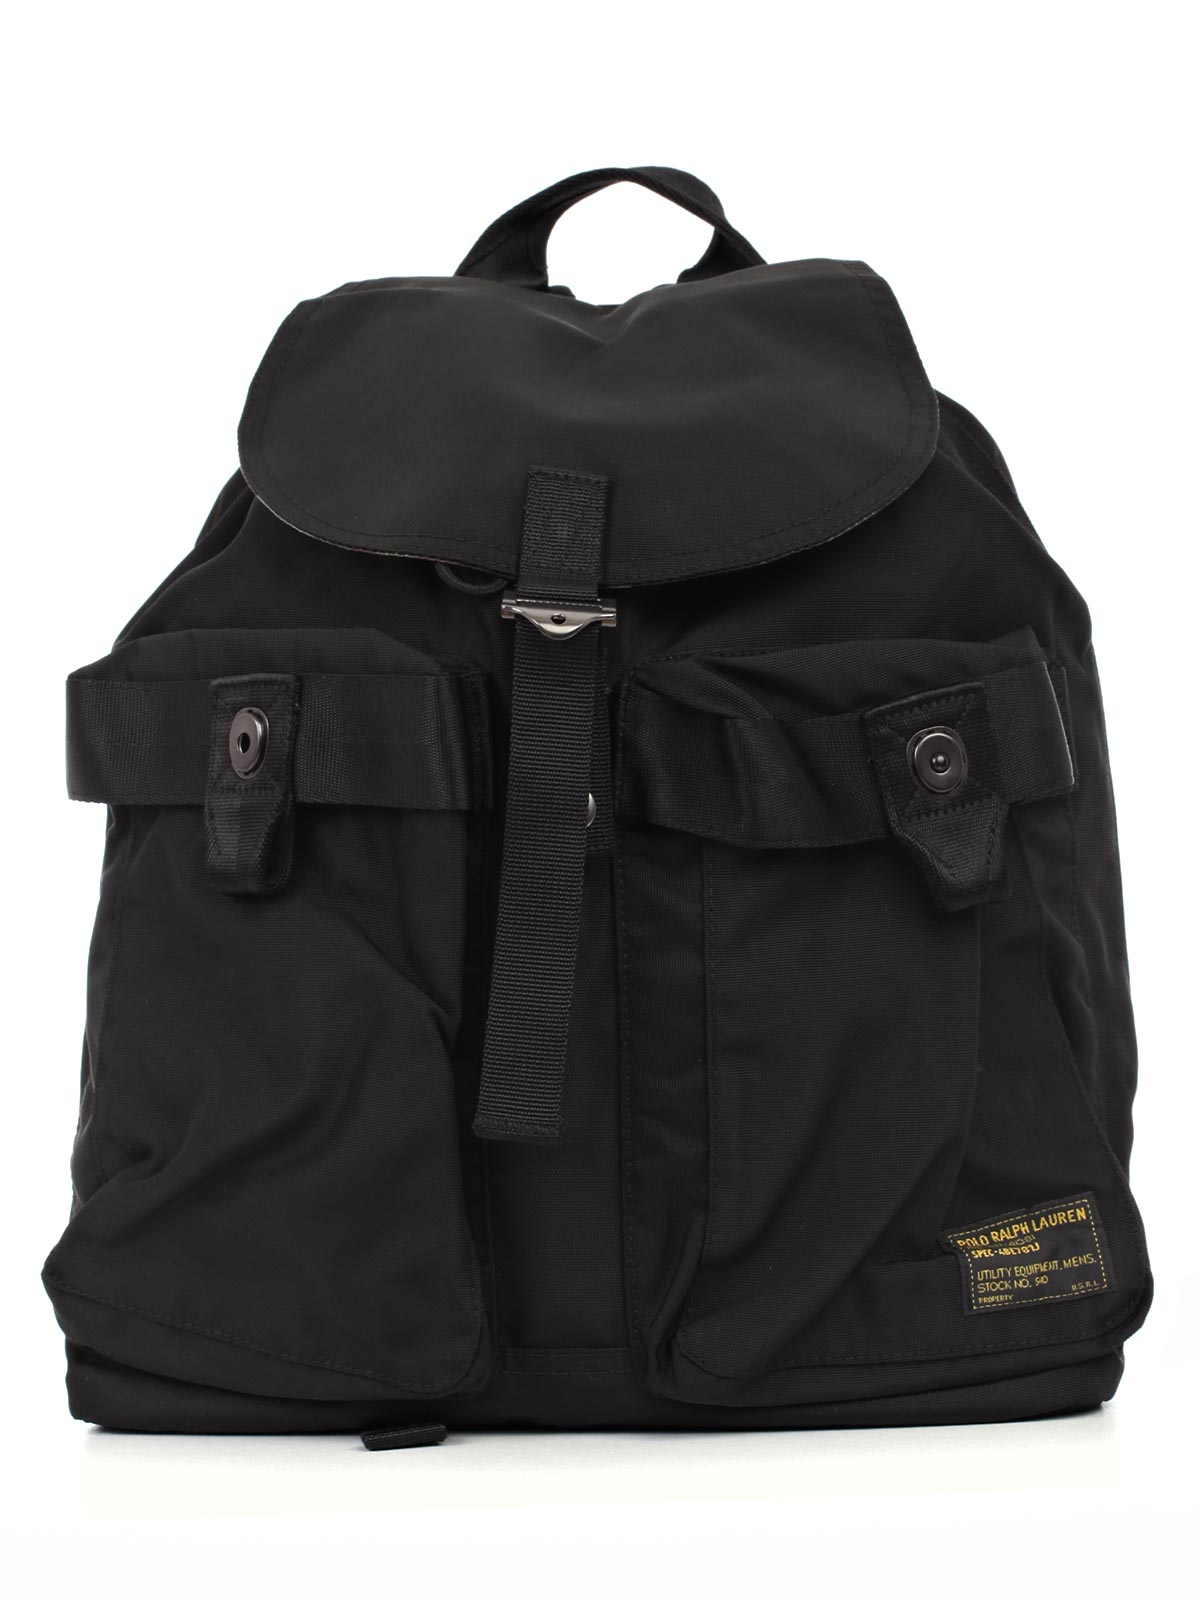 Picture of POLO RALPH LAUREN Bags ZAINO